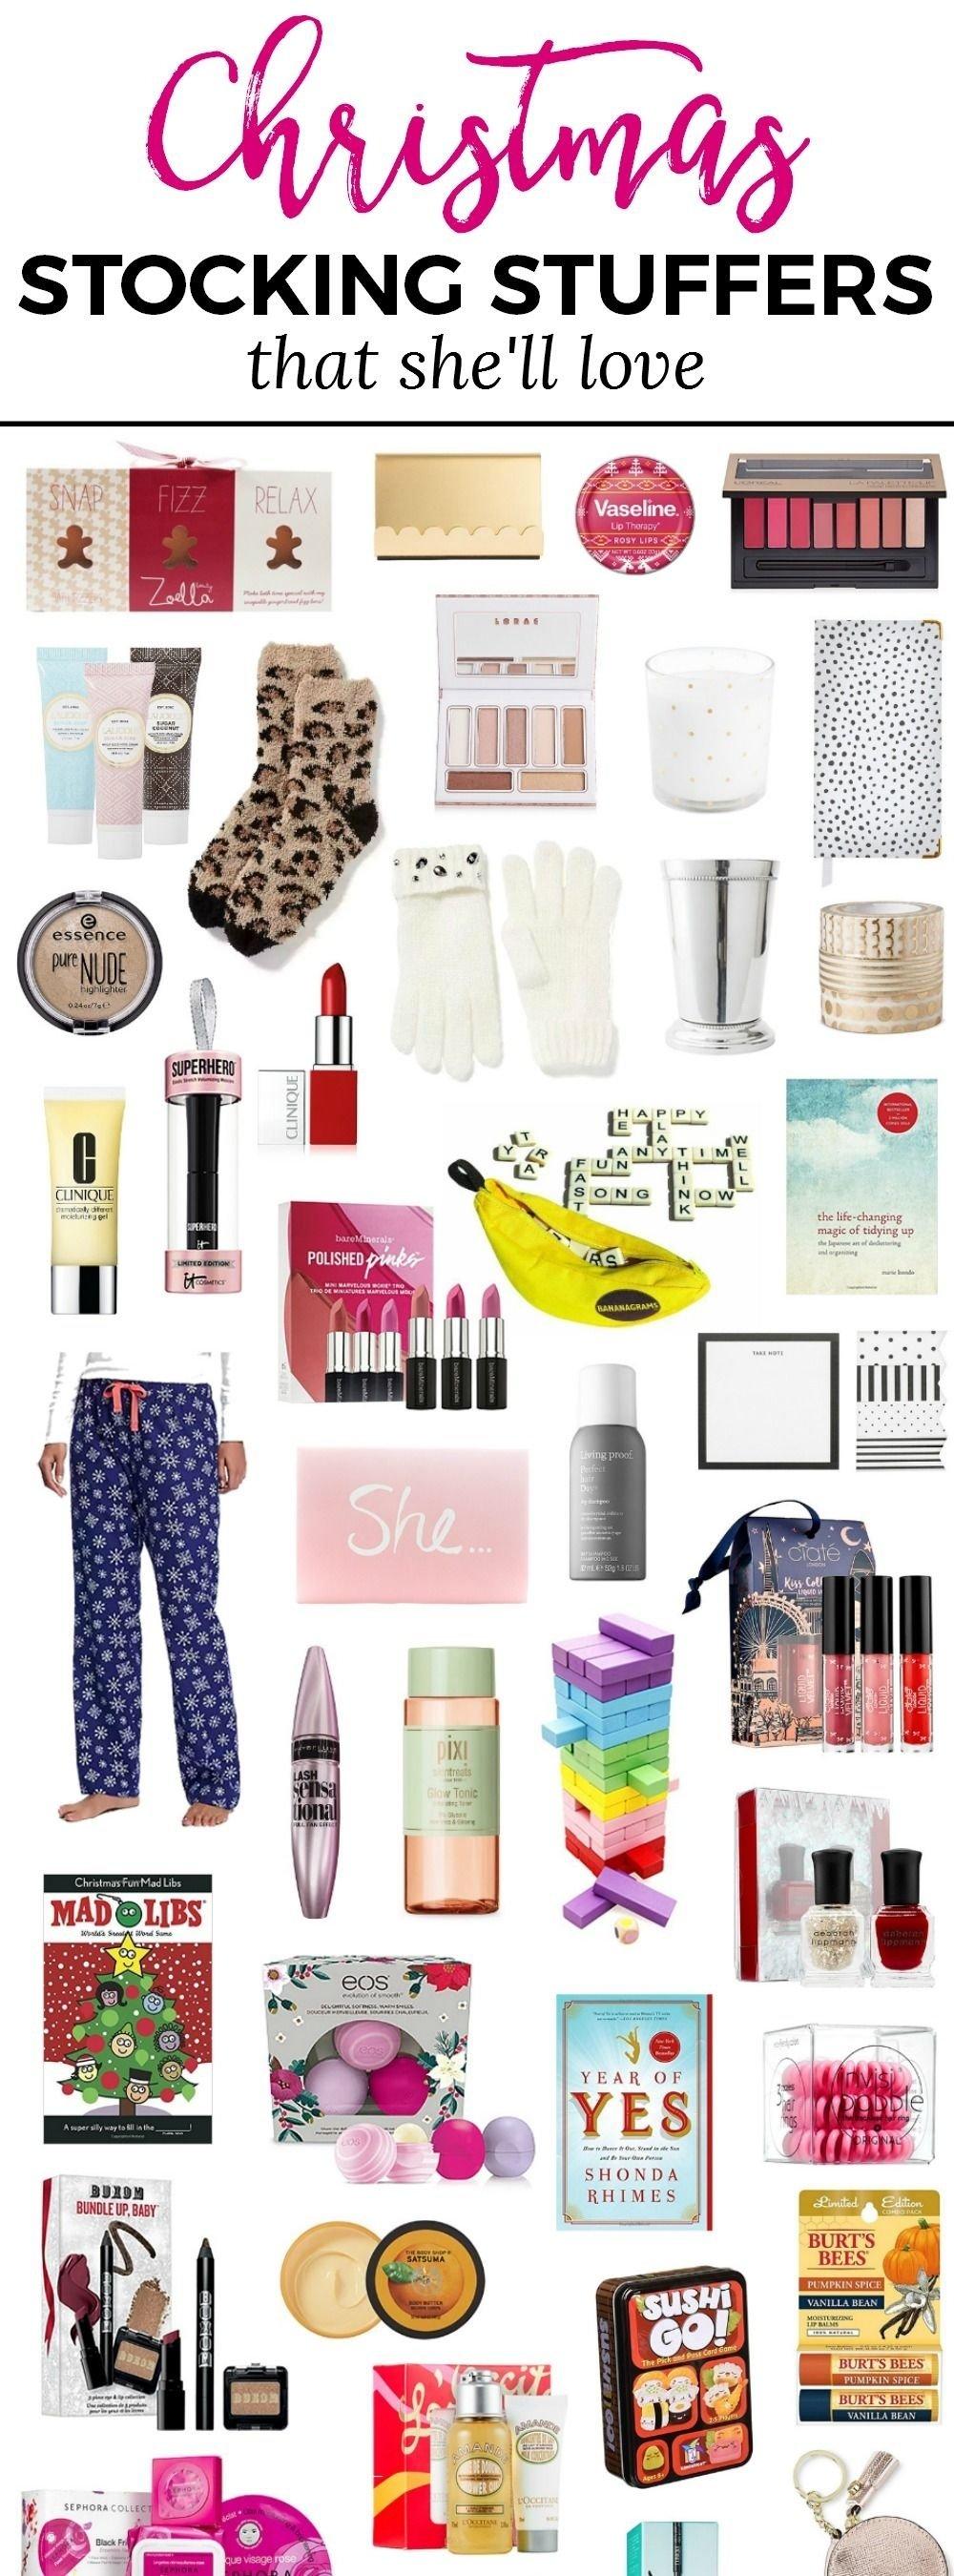 10 Stunning Stocking Stuffer Ideas For Women the best christmas stocking stuffer ideas for women christmas 1 2021